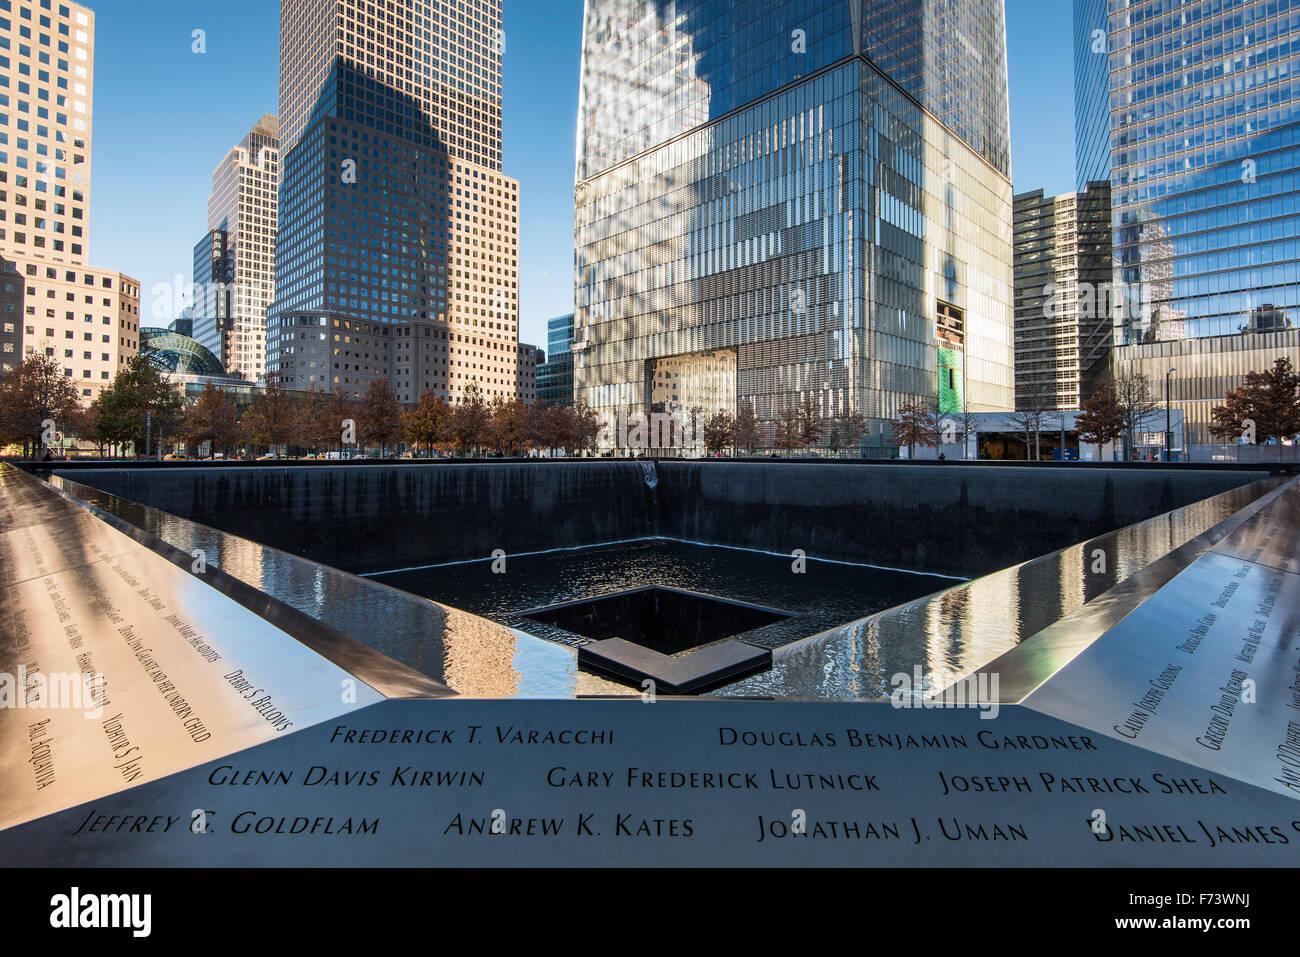 Il Nord Pool, National September 11 Memorial & Museum, la parte inferiore di Manhattan, New York, Stati Uniti d'America Foto Stock